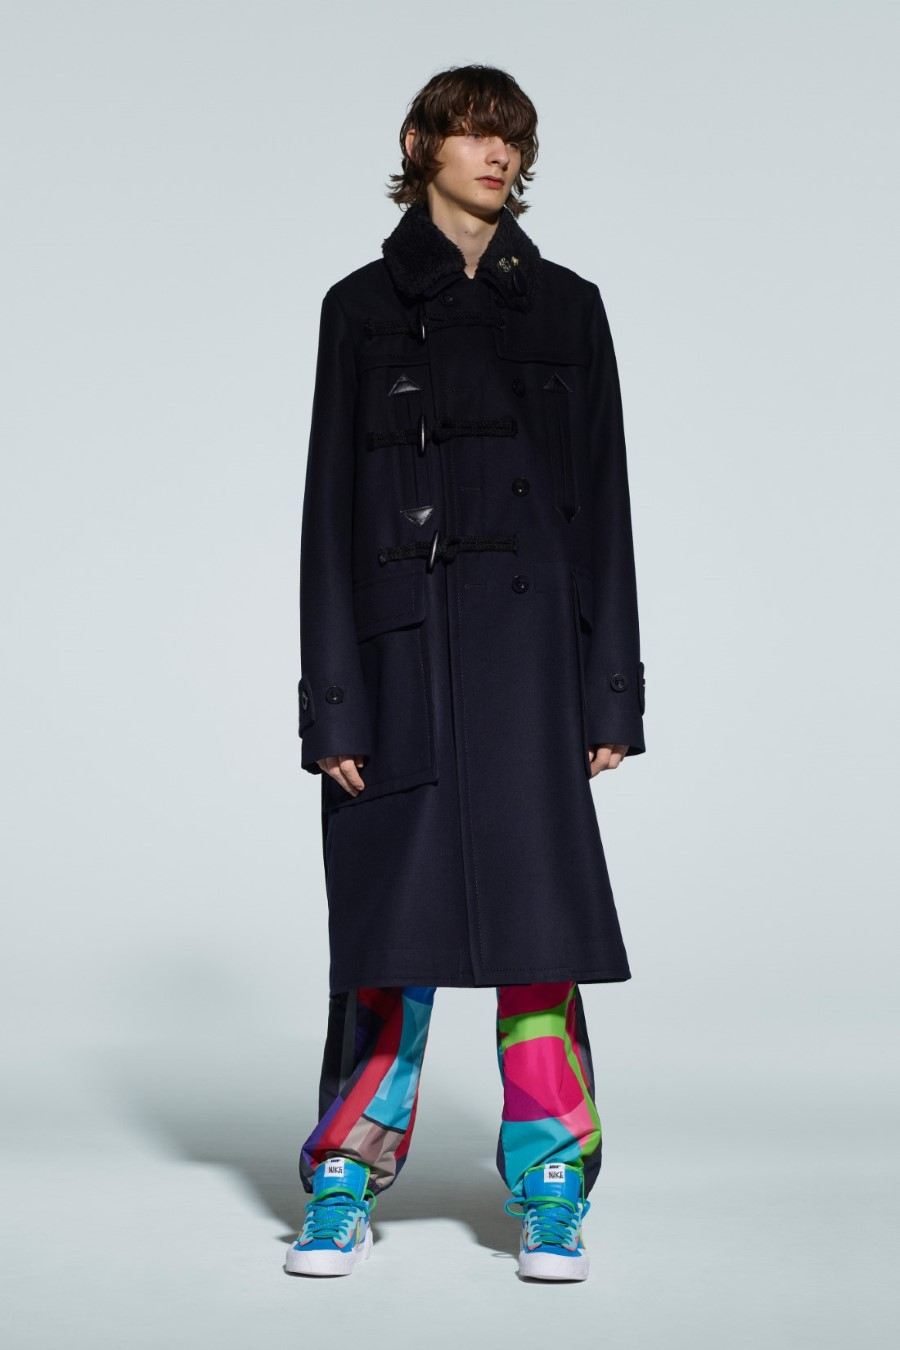 Sacai Men's Fall/Winter 2021 - Tokyo Fashion Week